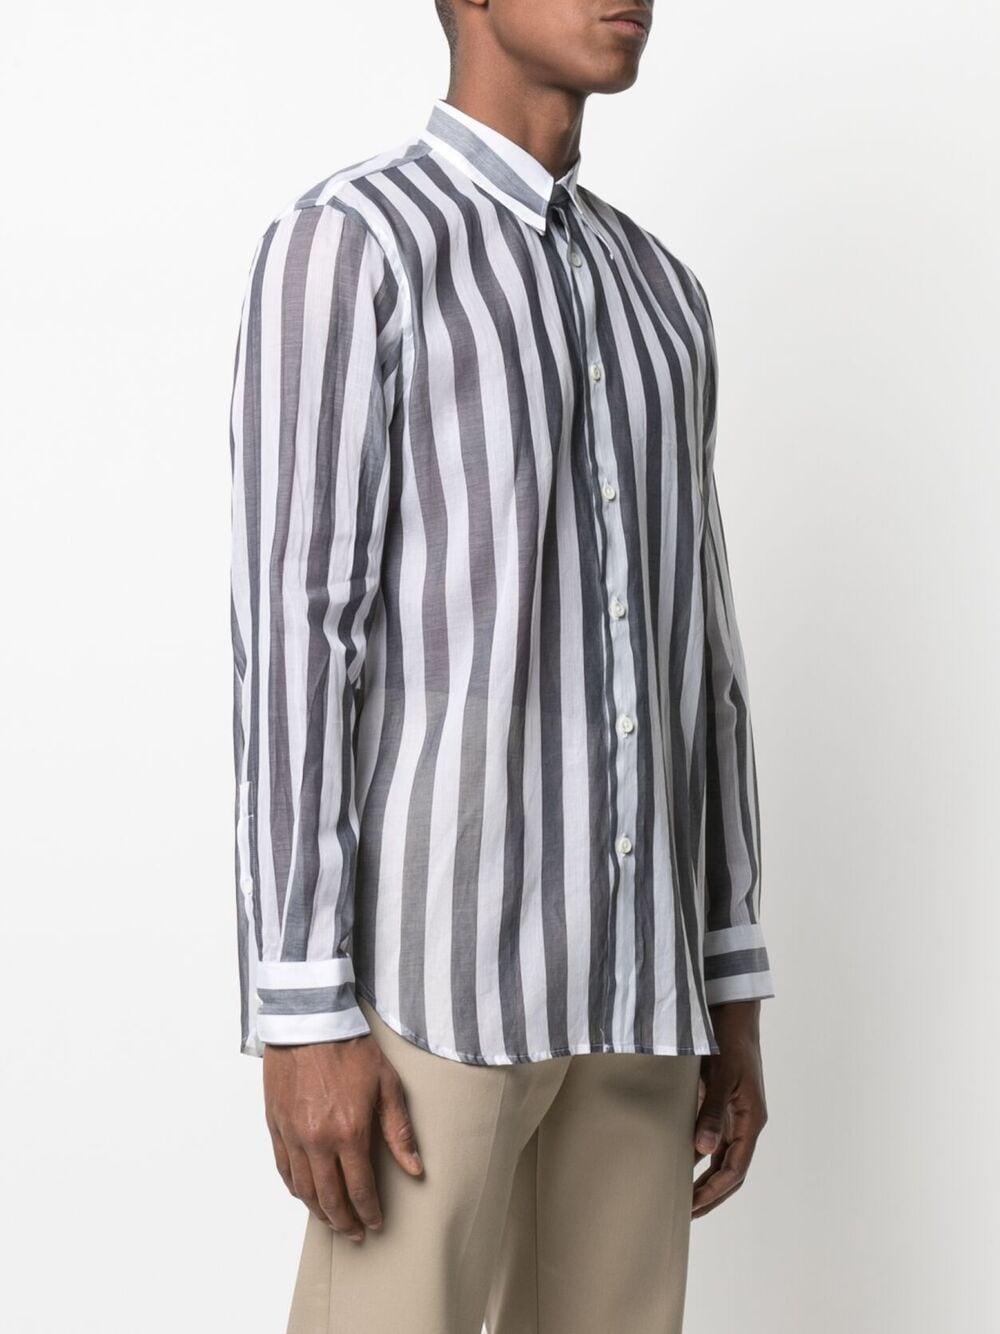 Sunflower camicia a righe uomo SUNFLOWER | Camicie | 1087999